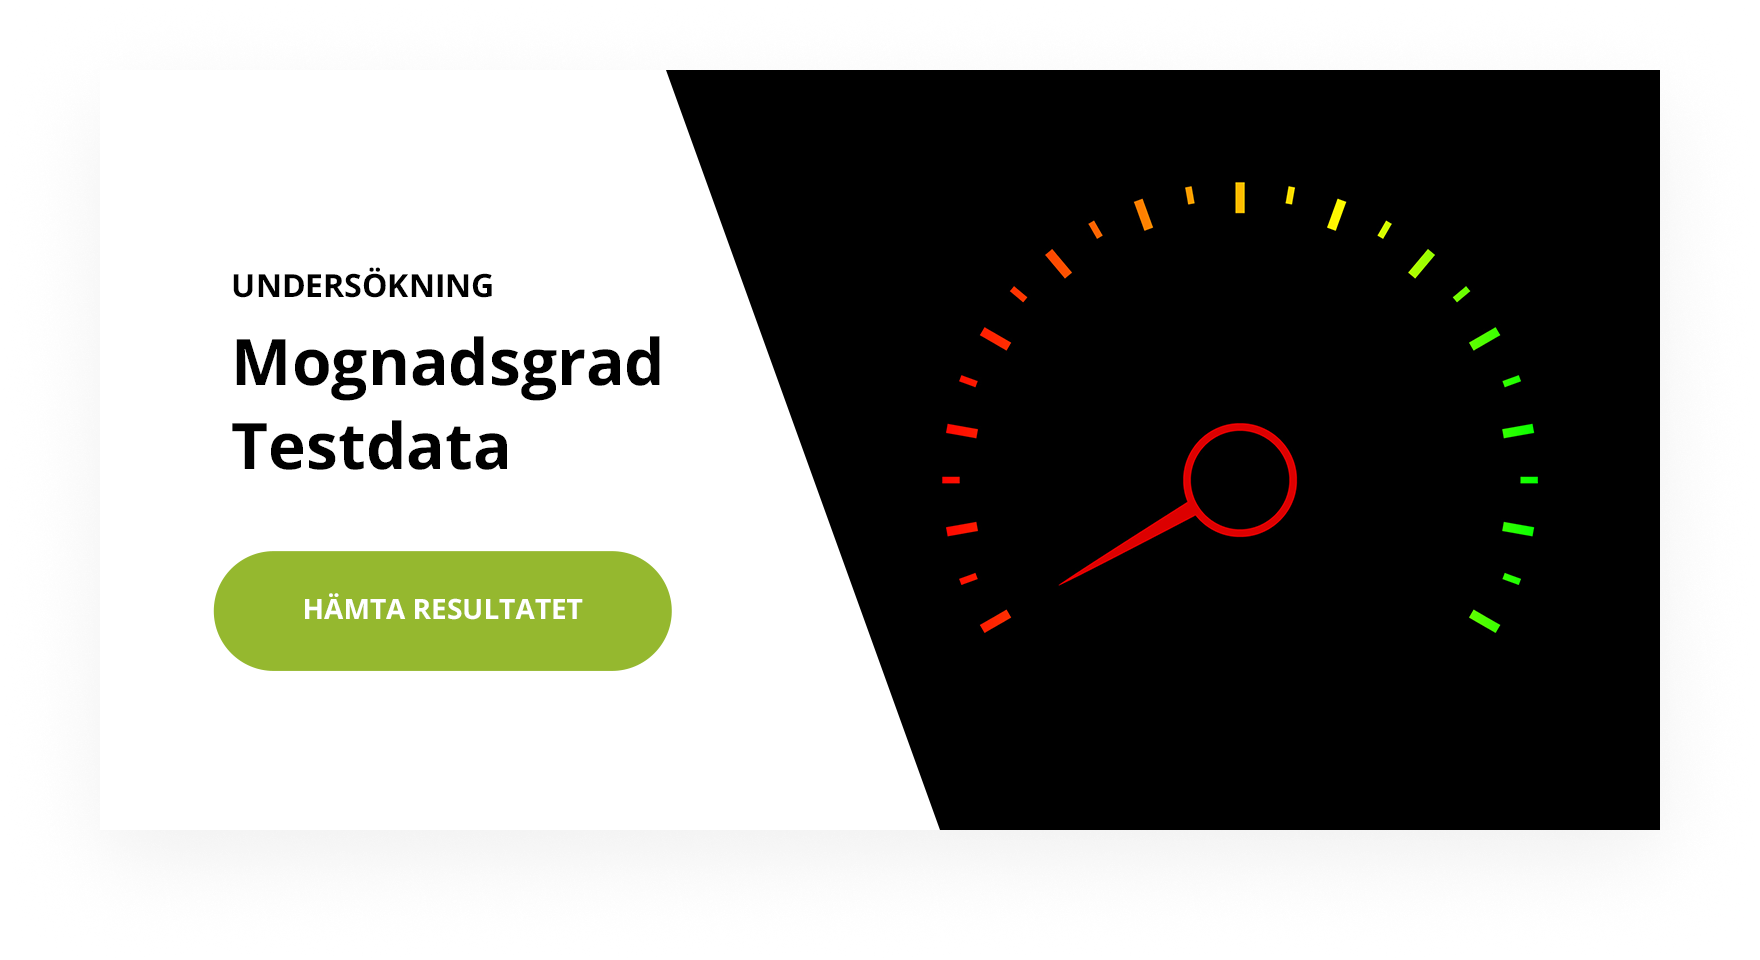 ADDQ - testdata